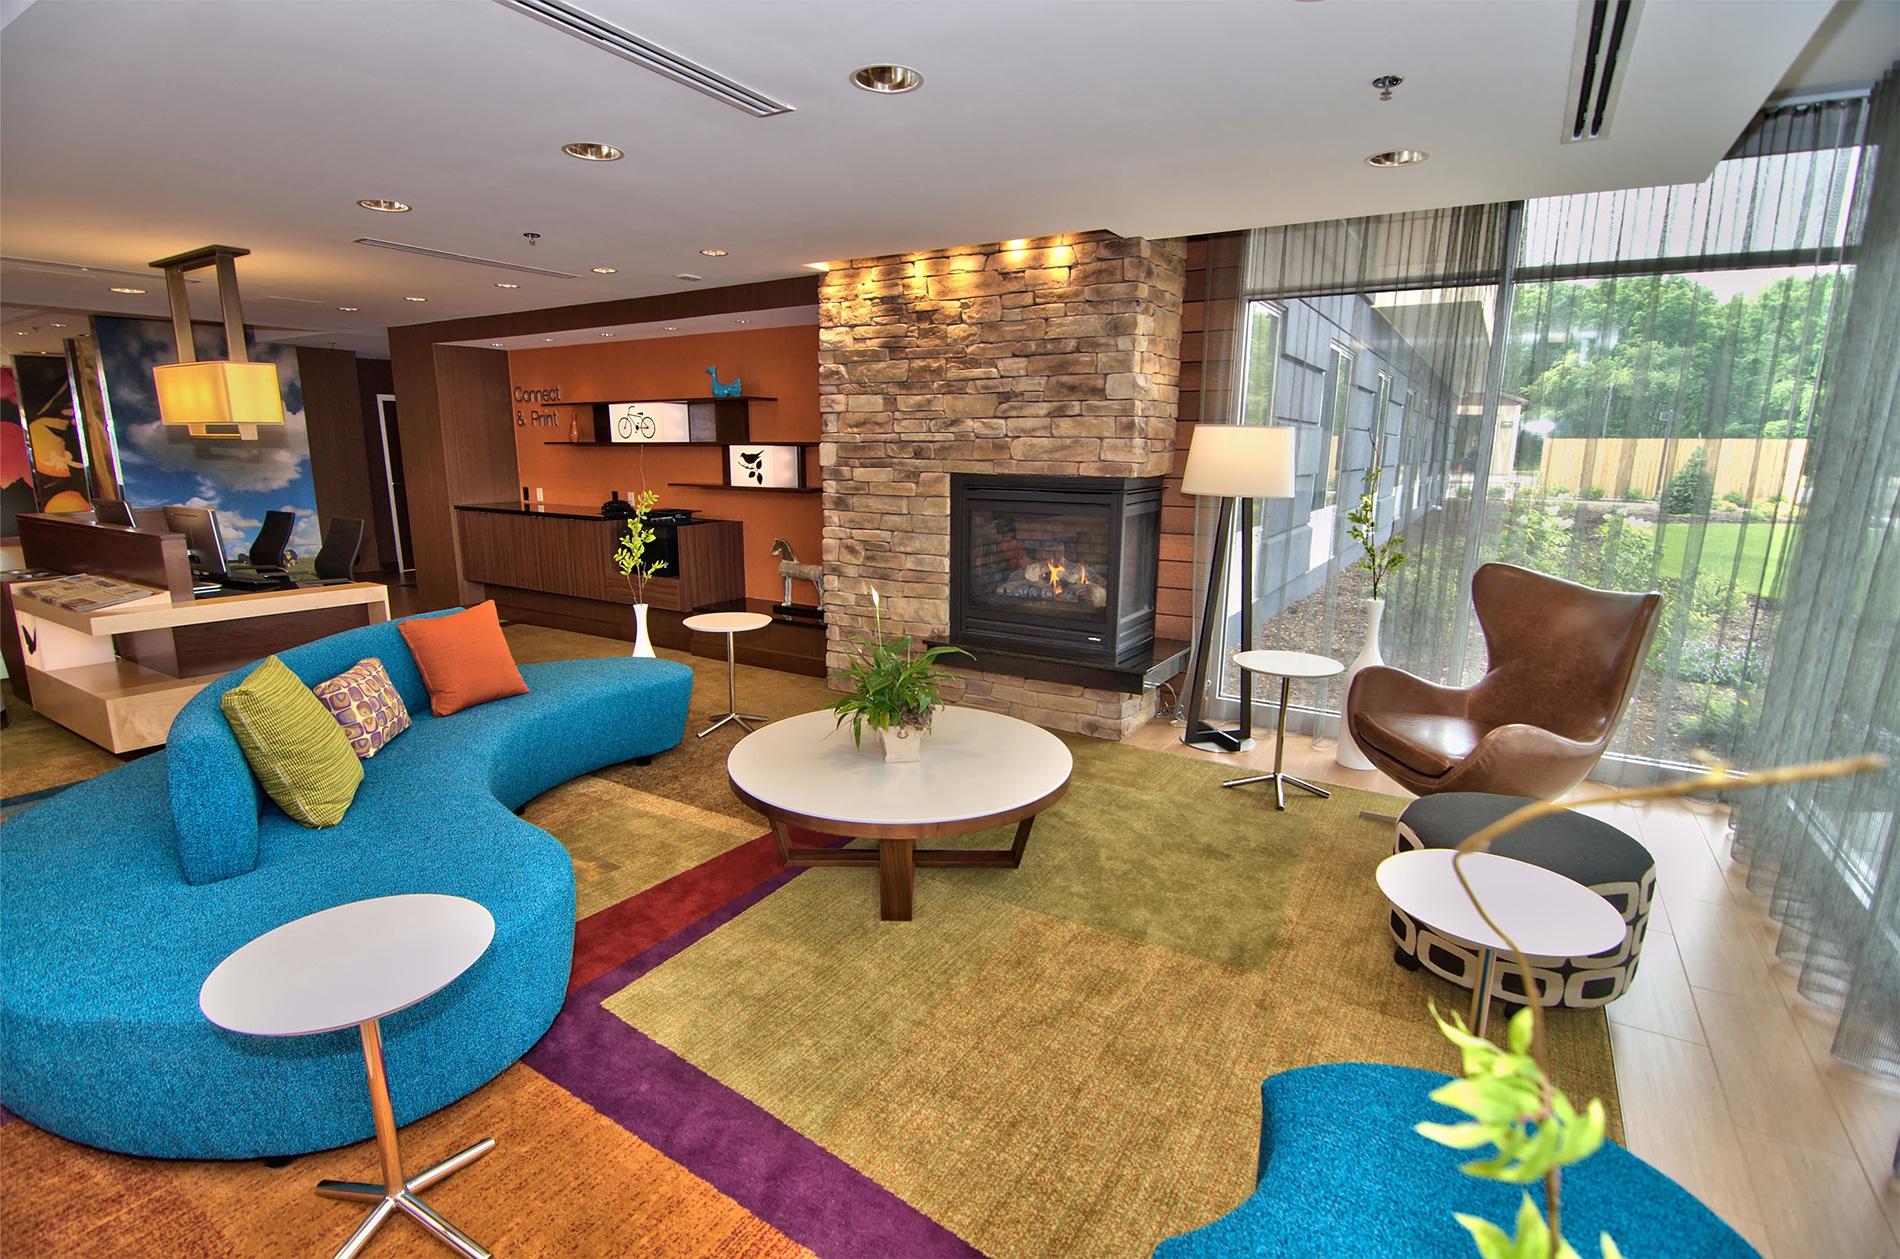 shaner hotel group to convert crowne plaza paramus new. Black Bedroom Furniture Sets. Home Design Ideas